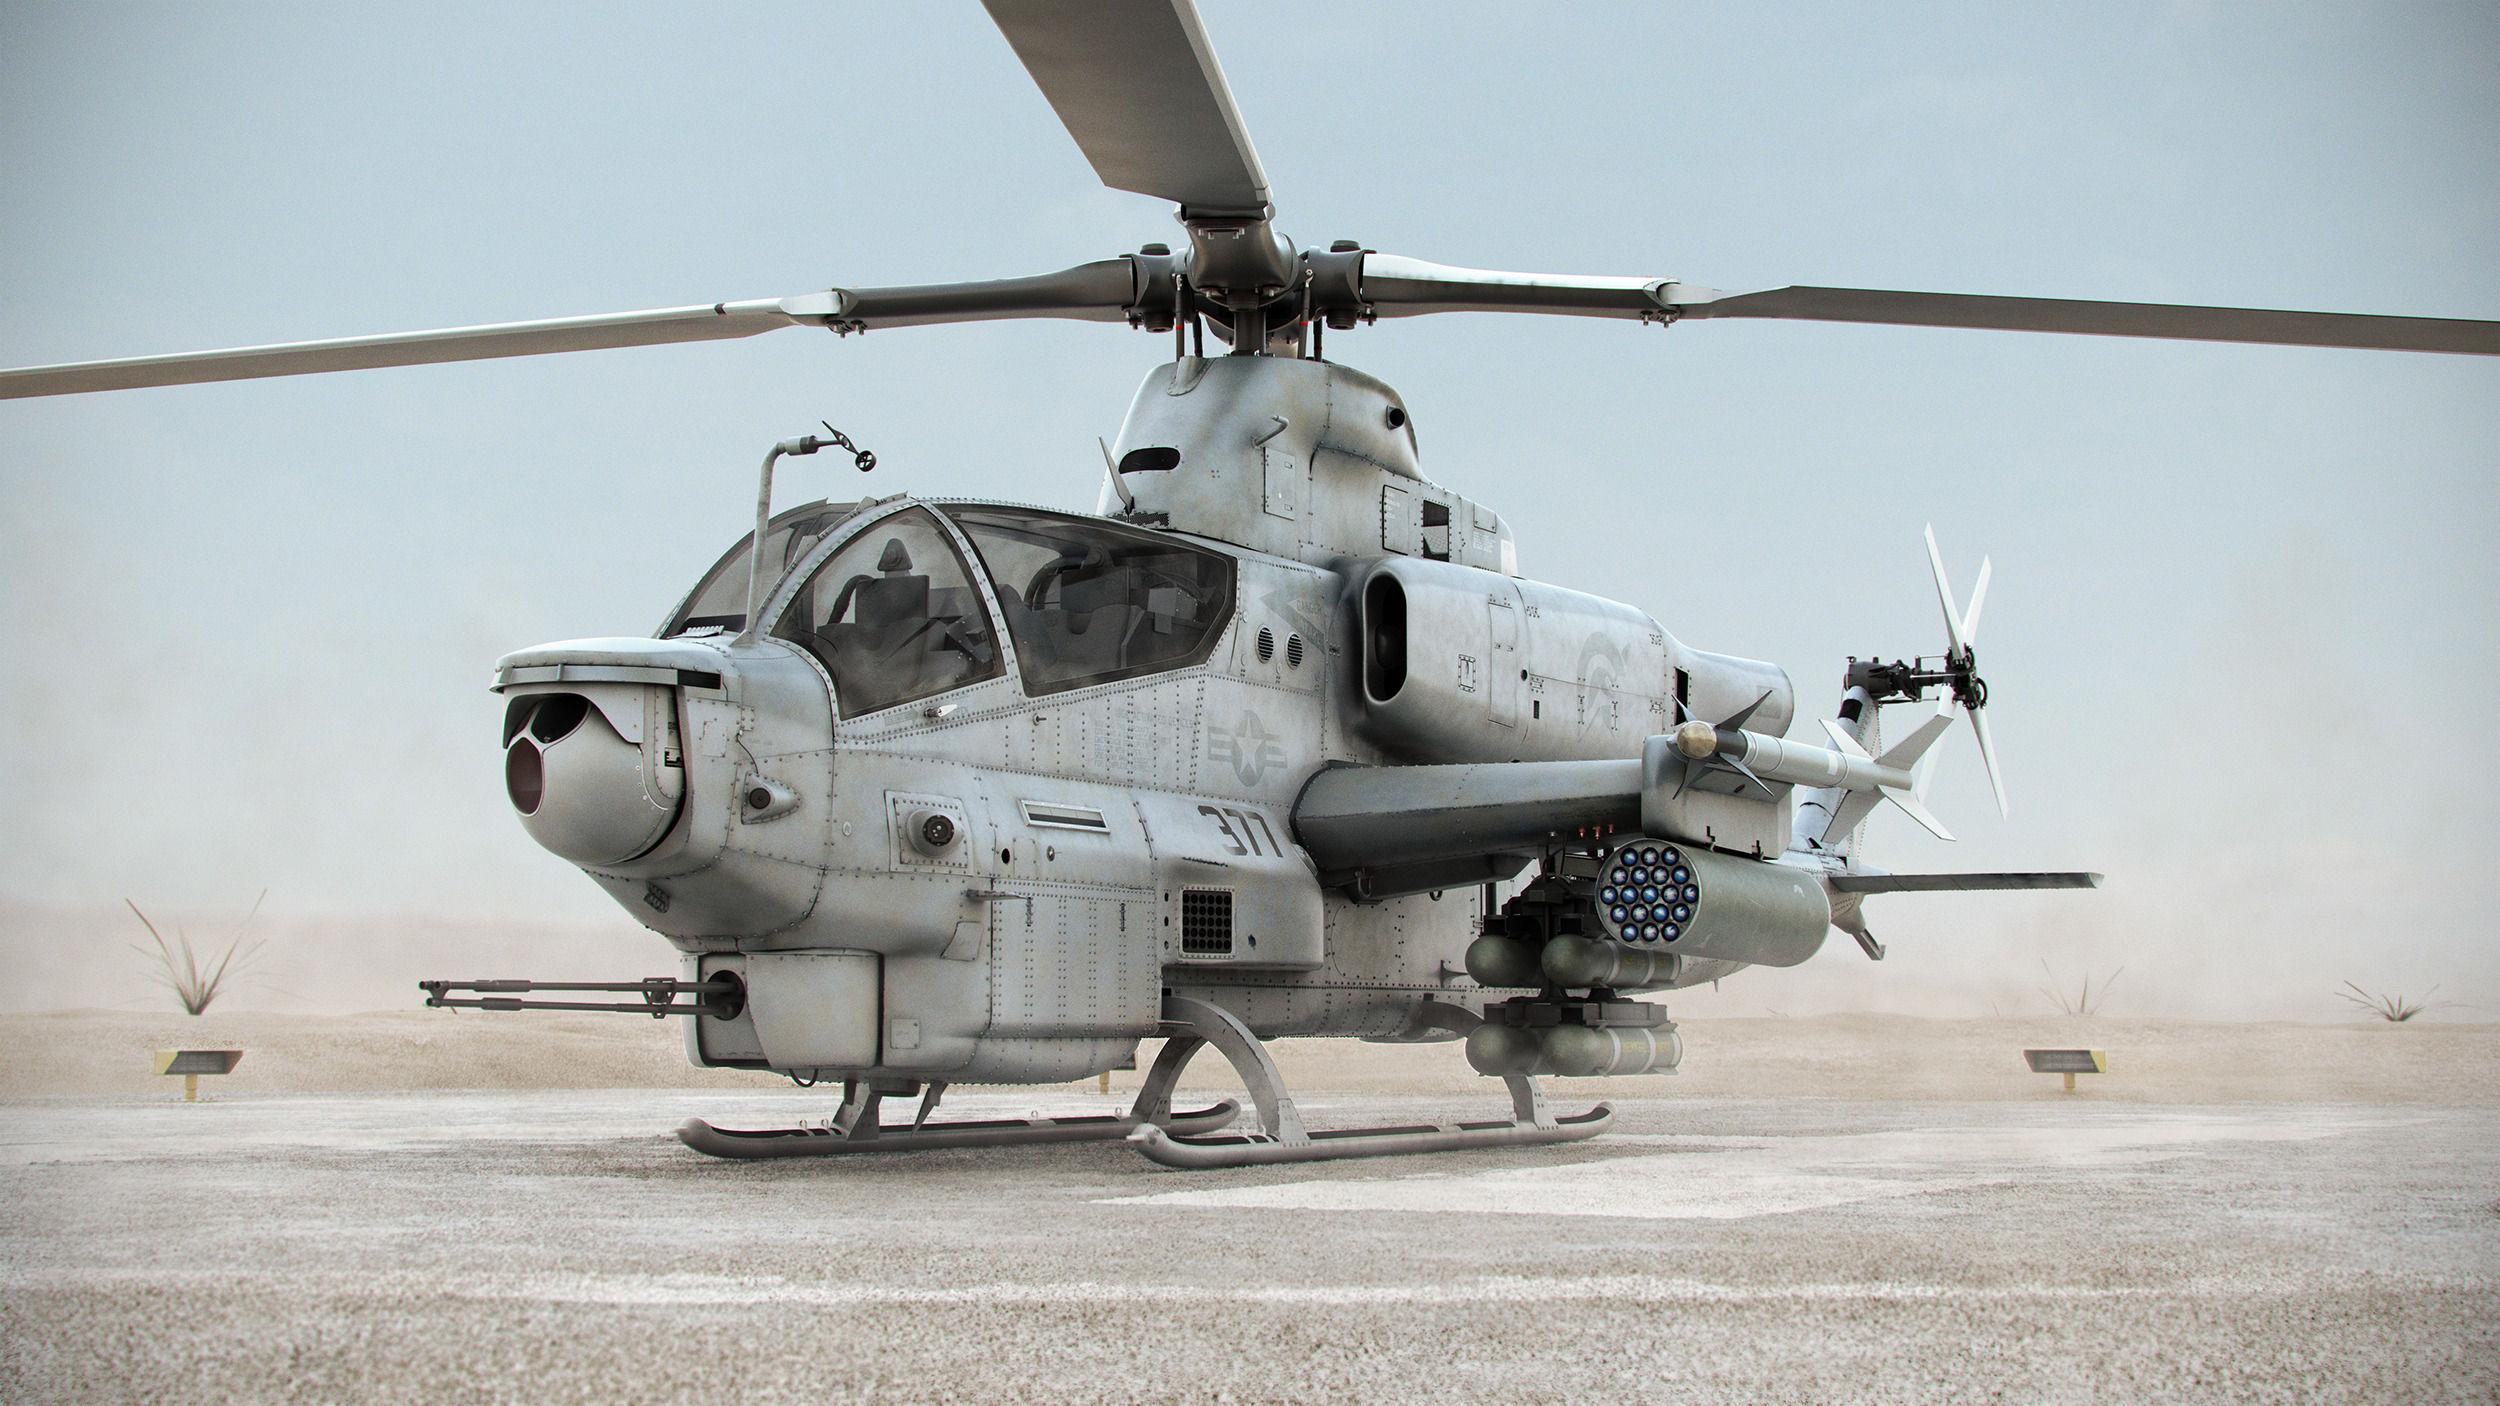 blackhawk helicopter model with Bell Ah 1z Viper Attack Helicopter 2 on Sikorsky S 70 in addition Black Hawk Down 11 Presumed Dead moreover S 70A 20 UH 60M 20Black 20Hawk  20HH 60M furthermore Modernizacion En Flota De Helicopteros De Estados Unidos 10946 besides Helicopters In The U S Coast Guard.